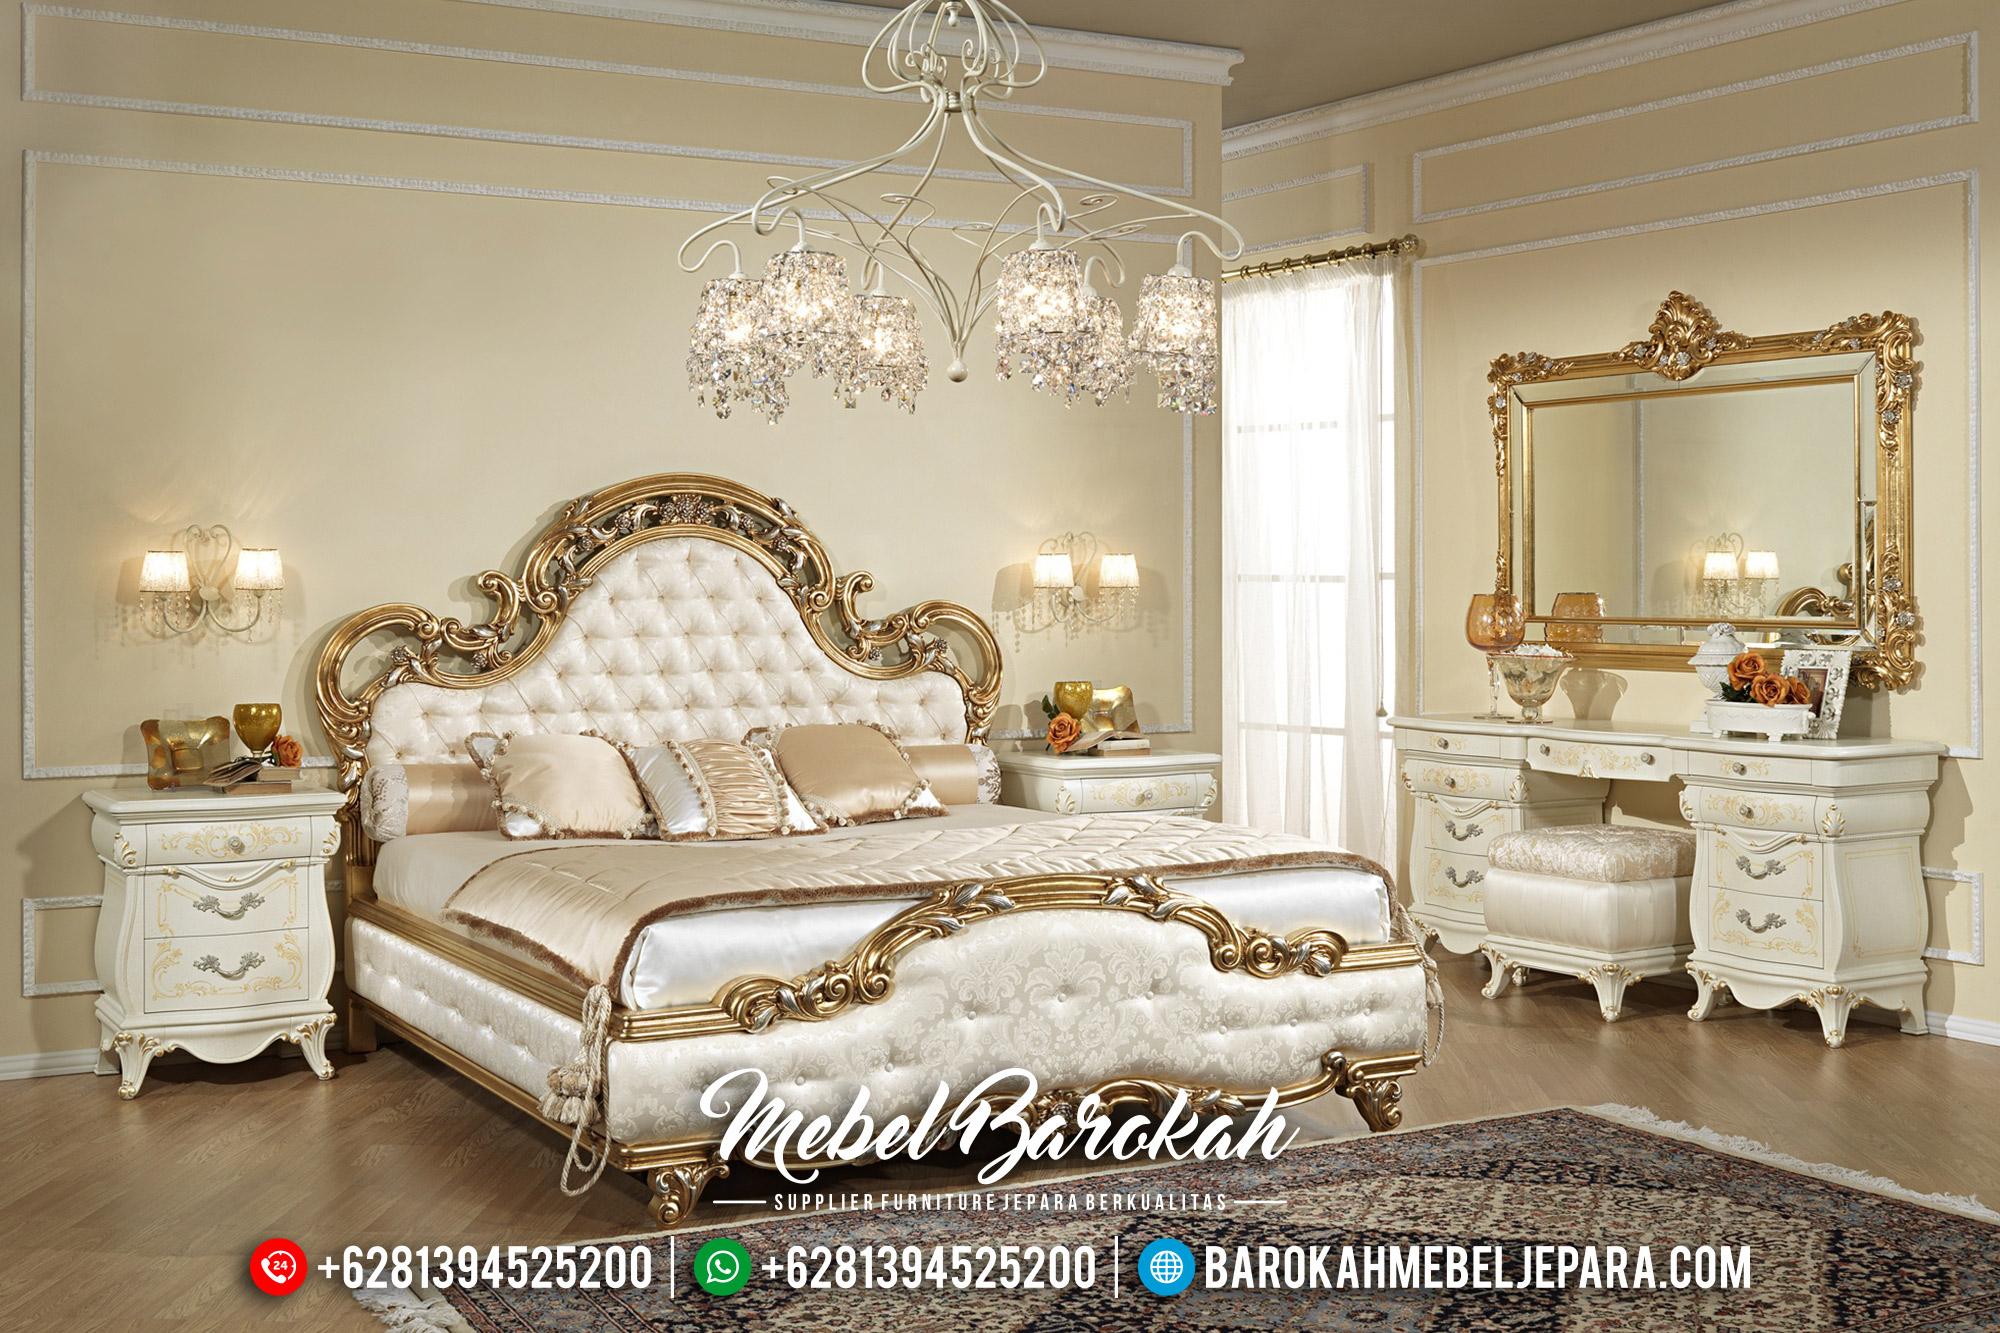 Fontana Tempat Tidur Ukiran Mewah Luxury Classic Golden Glossy Classy Antique MB-0542